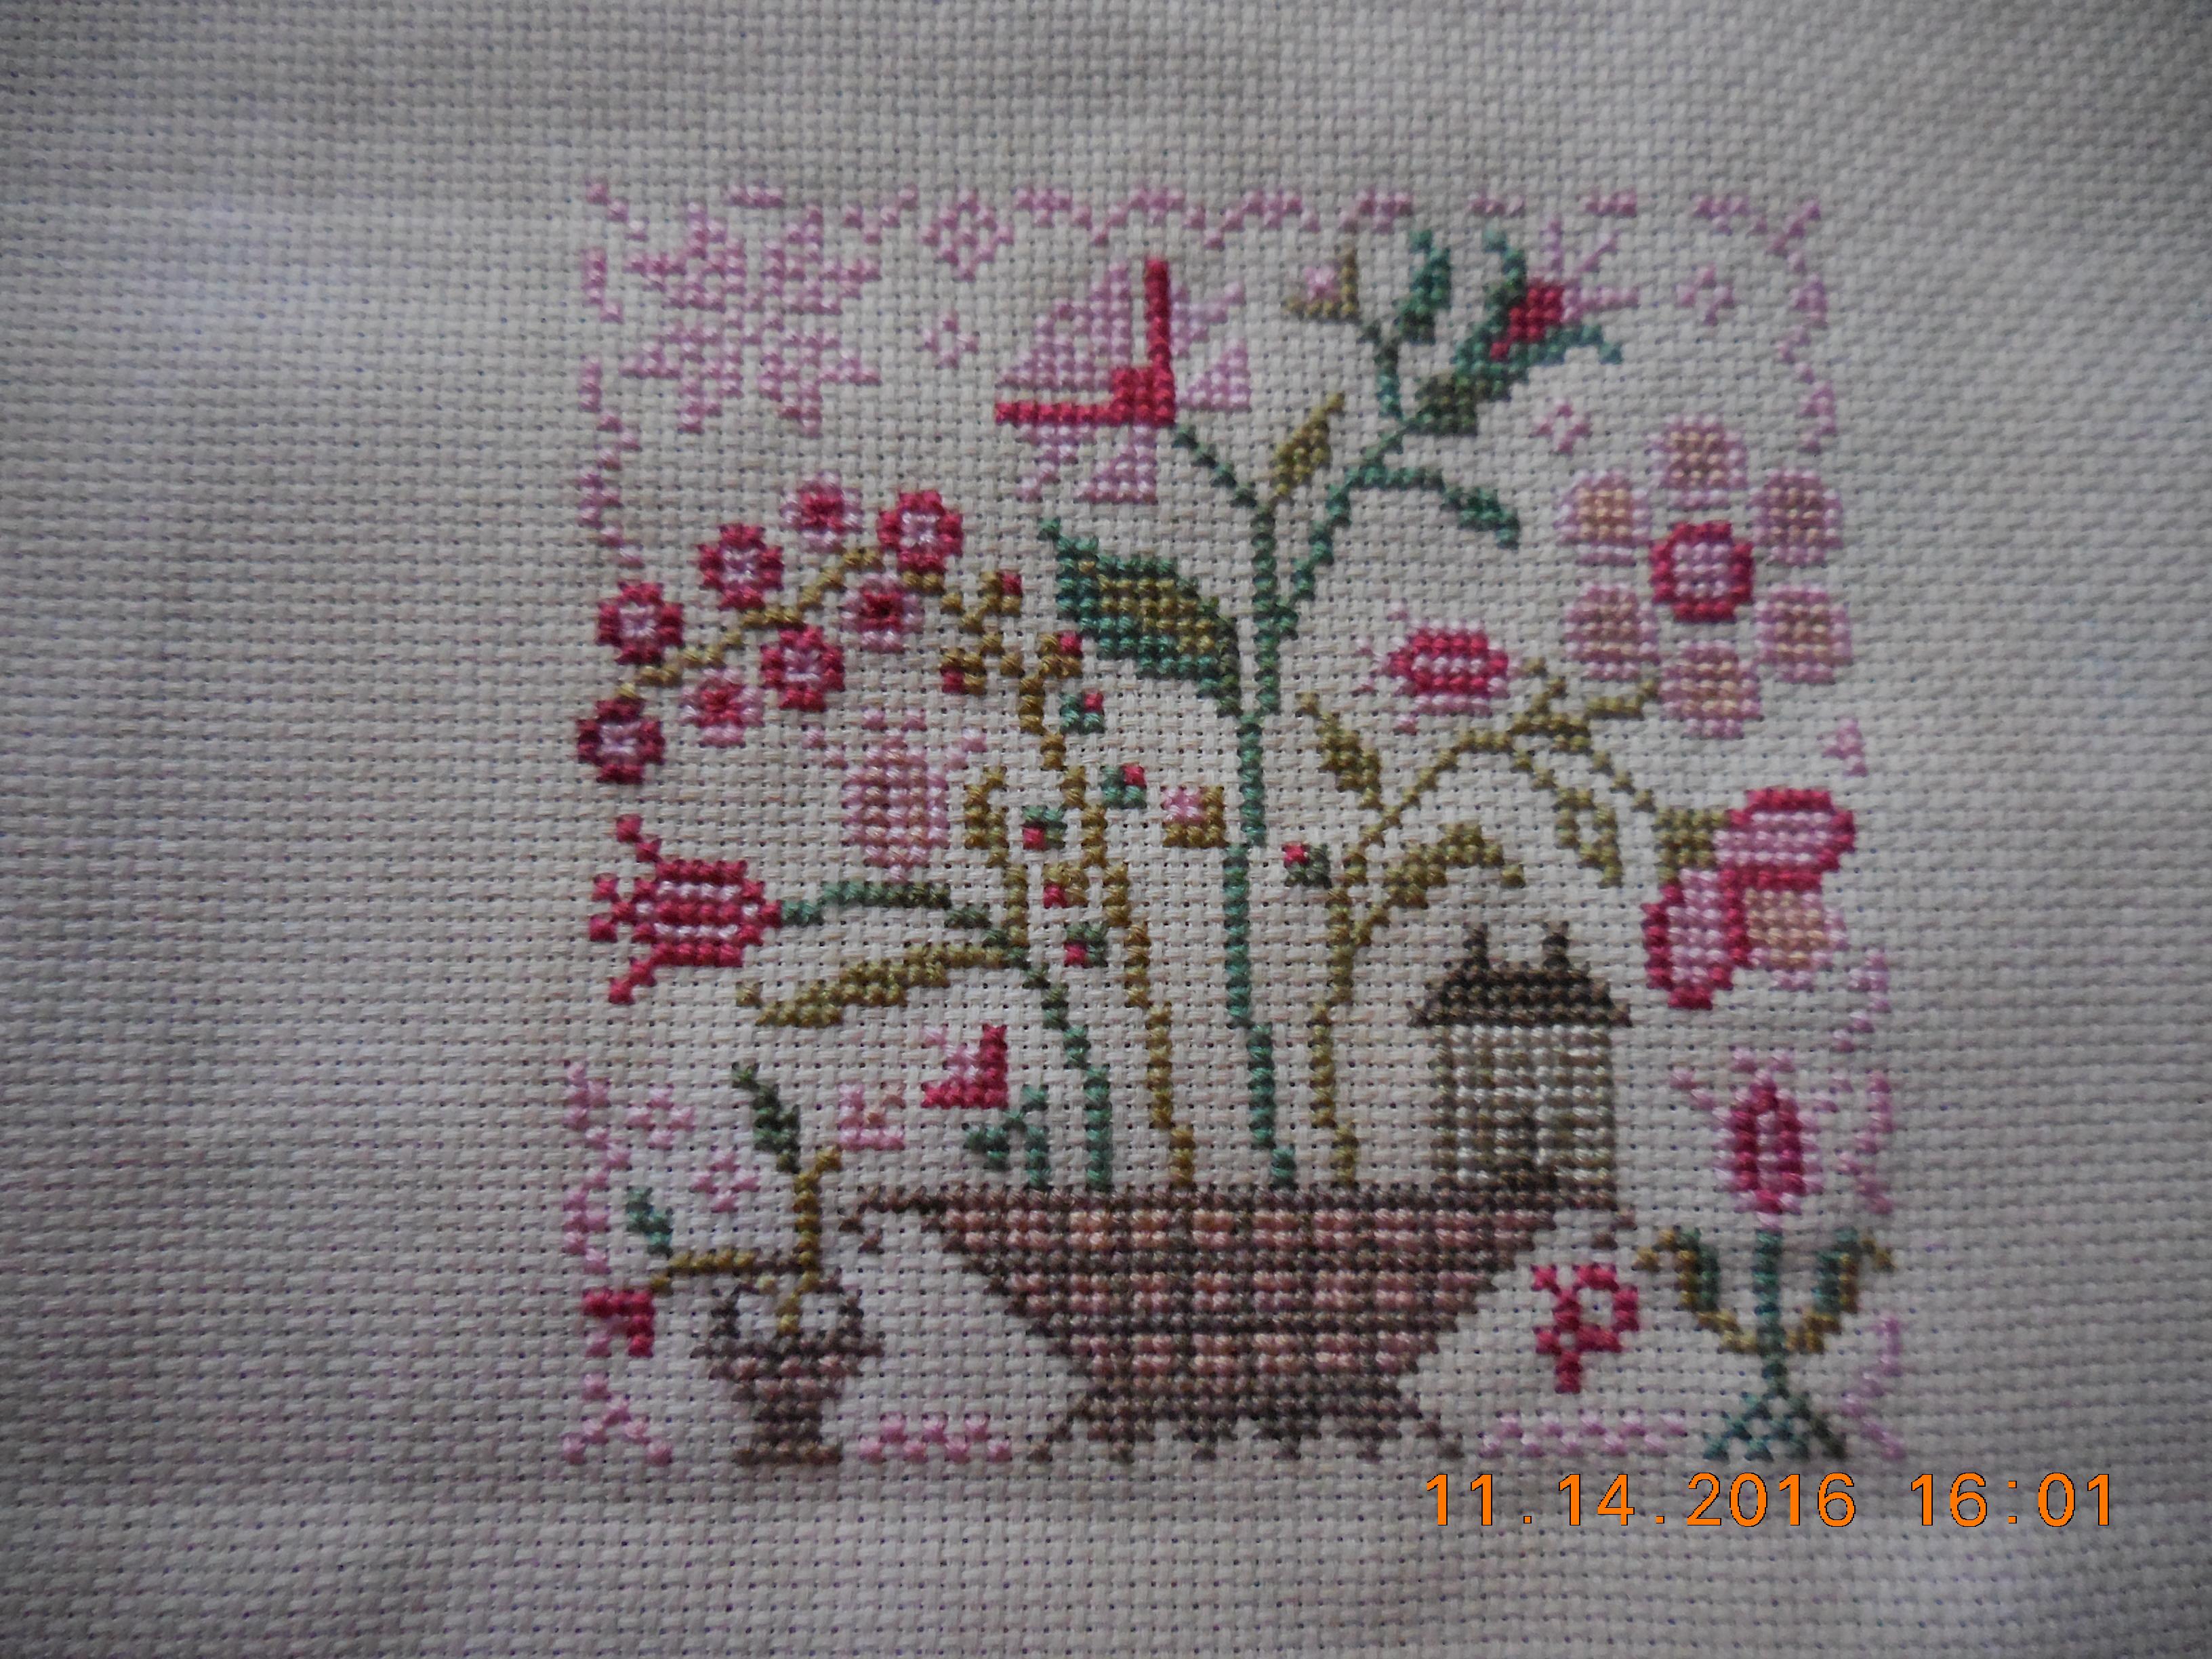 Pat 39 s cross stitch corner a place to share a craft i love for Christmas garden blackbird designs